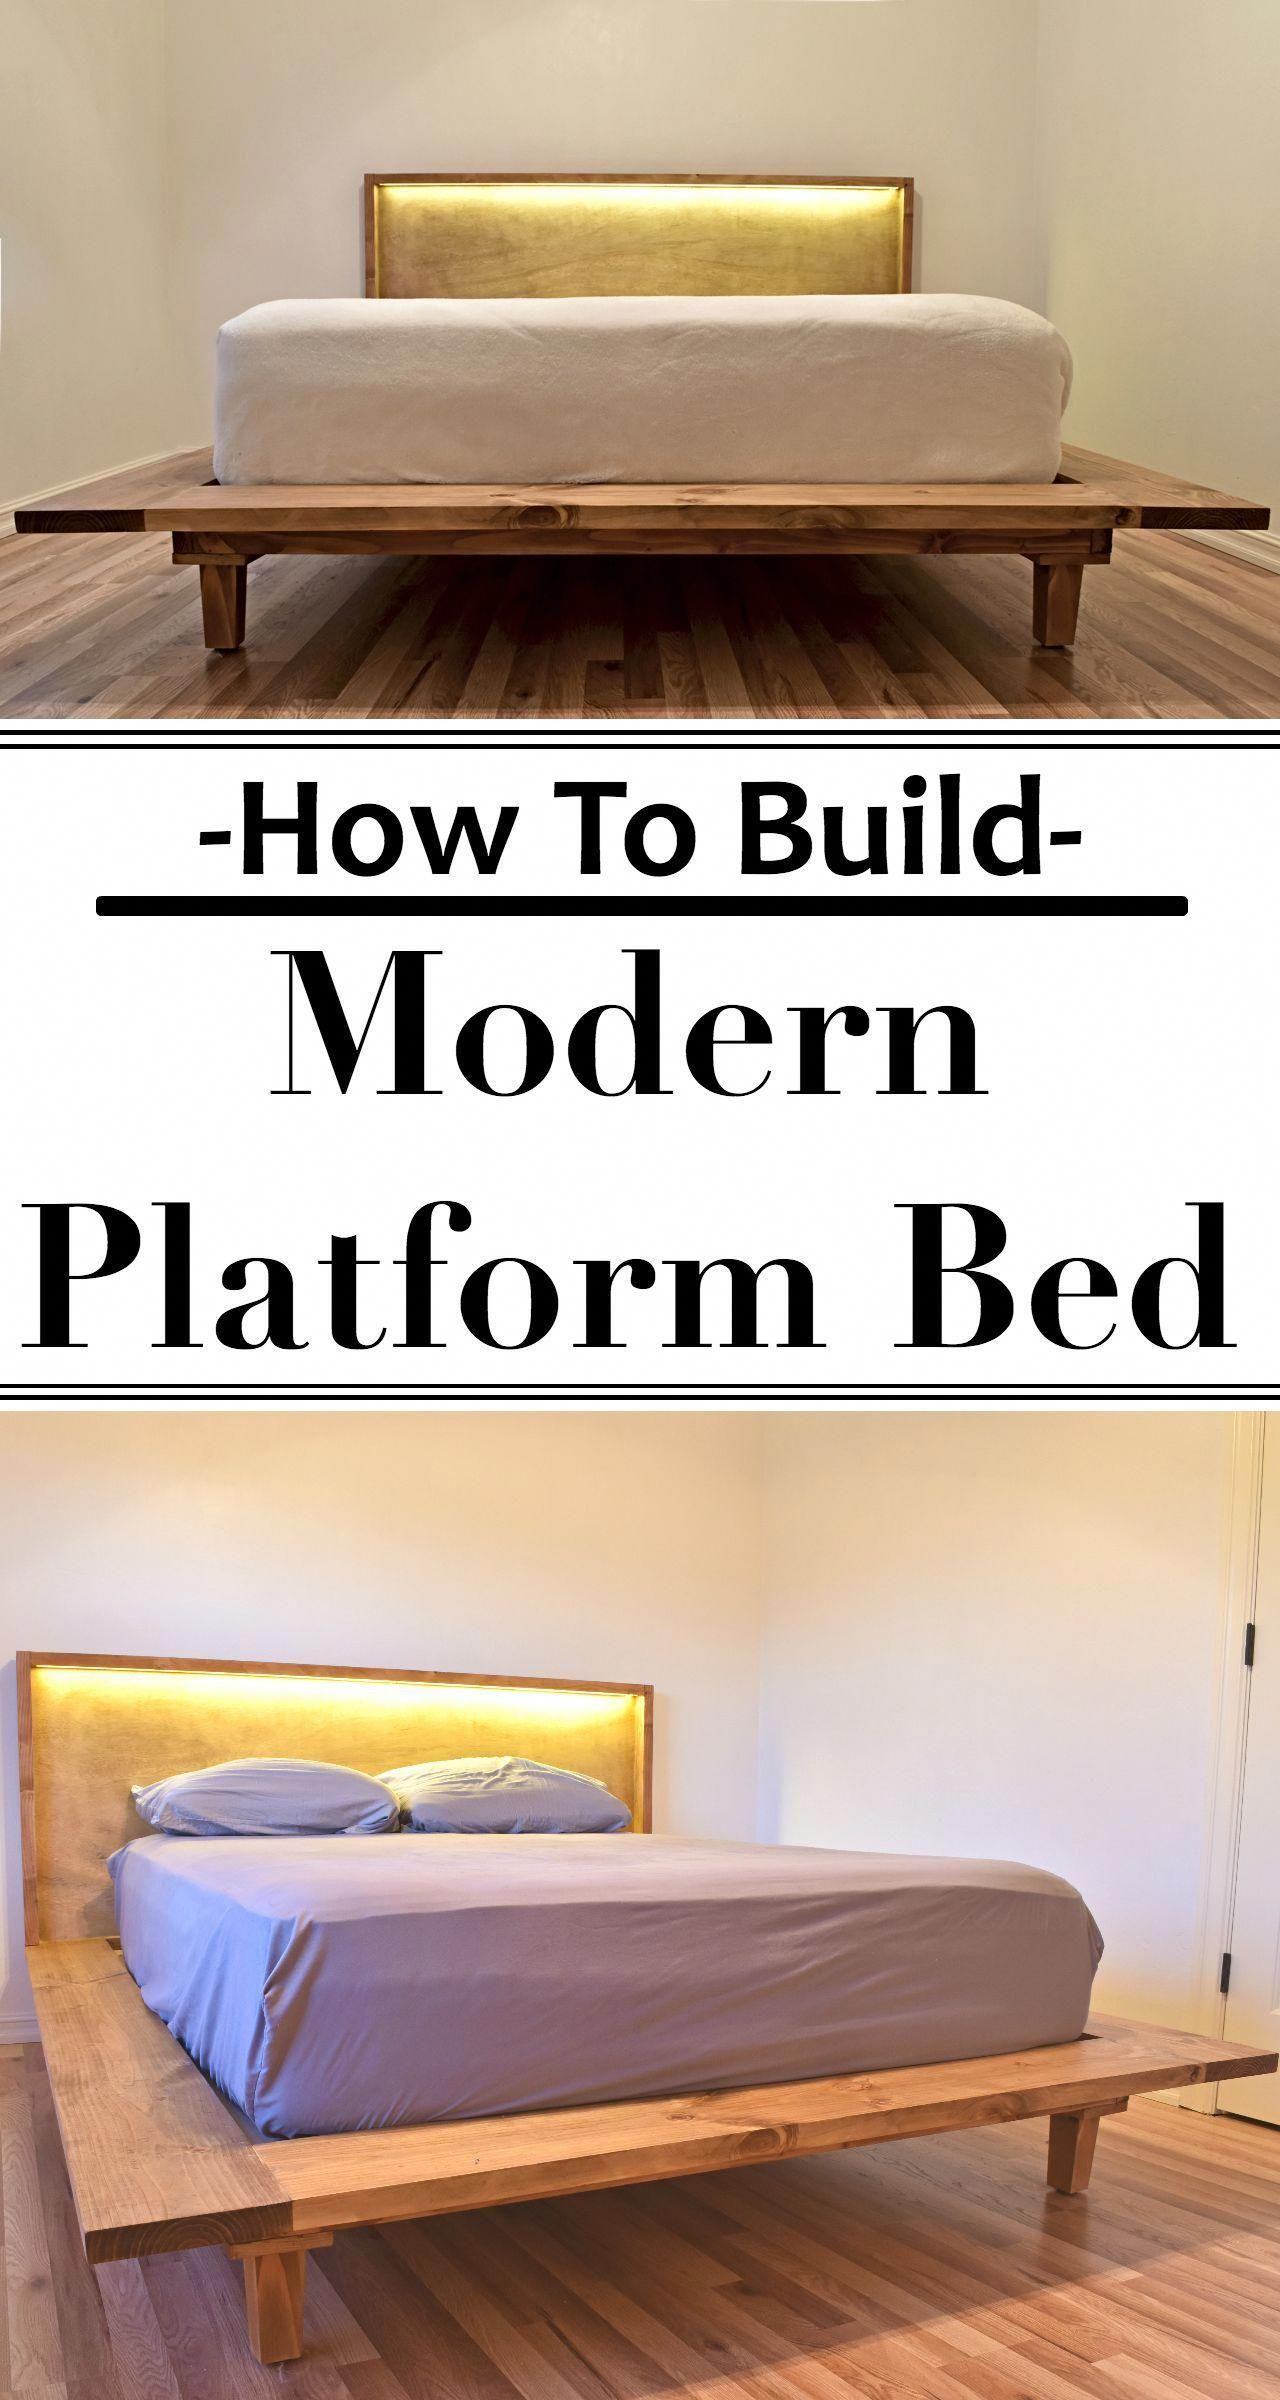 how to build a modern platform bed woodworking workshop decor rh pinterest com